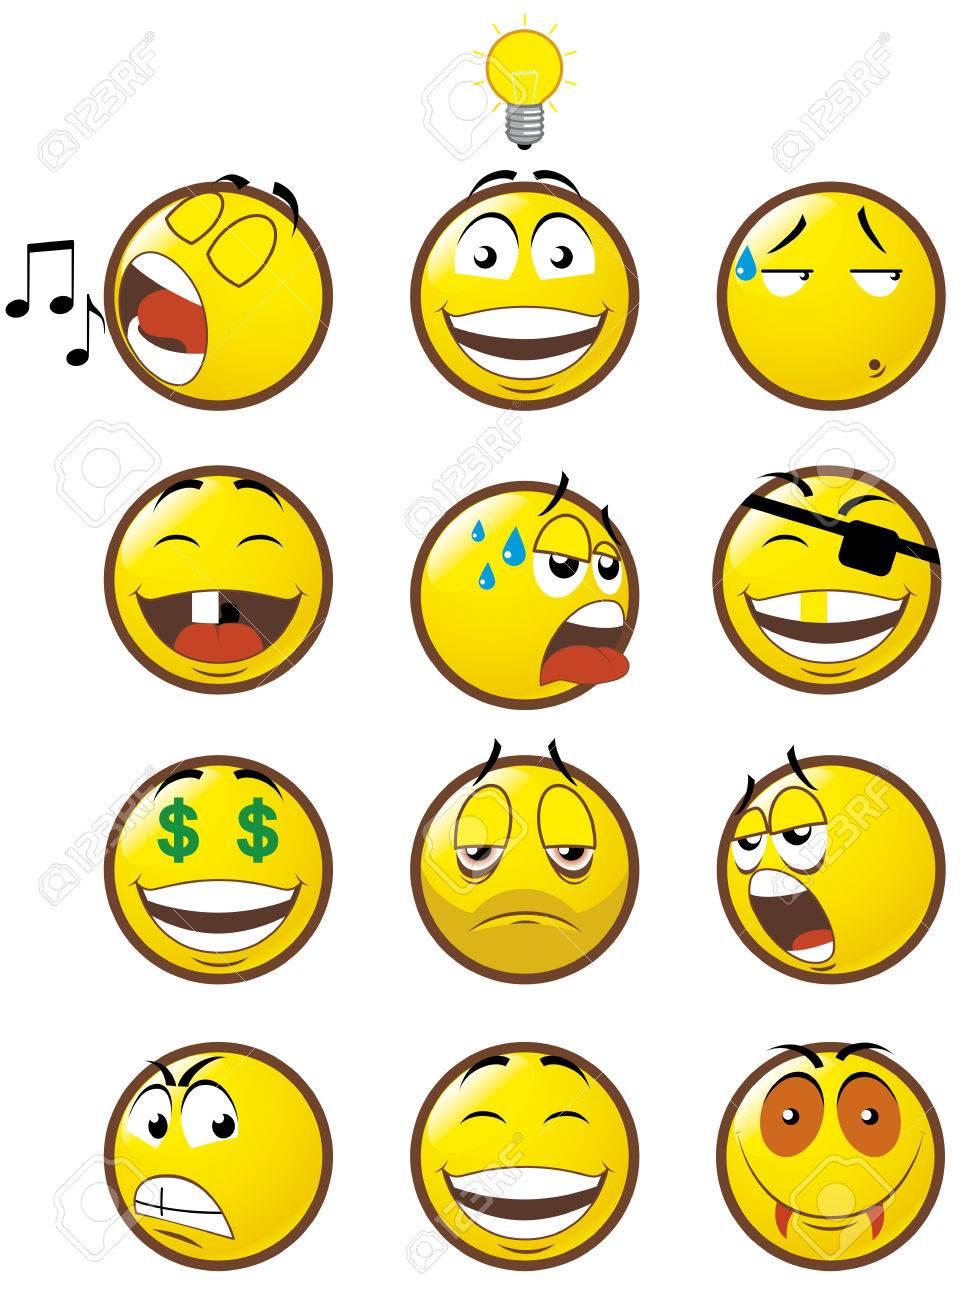 Emoticons 3 Stock Vector - 3670444